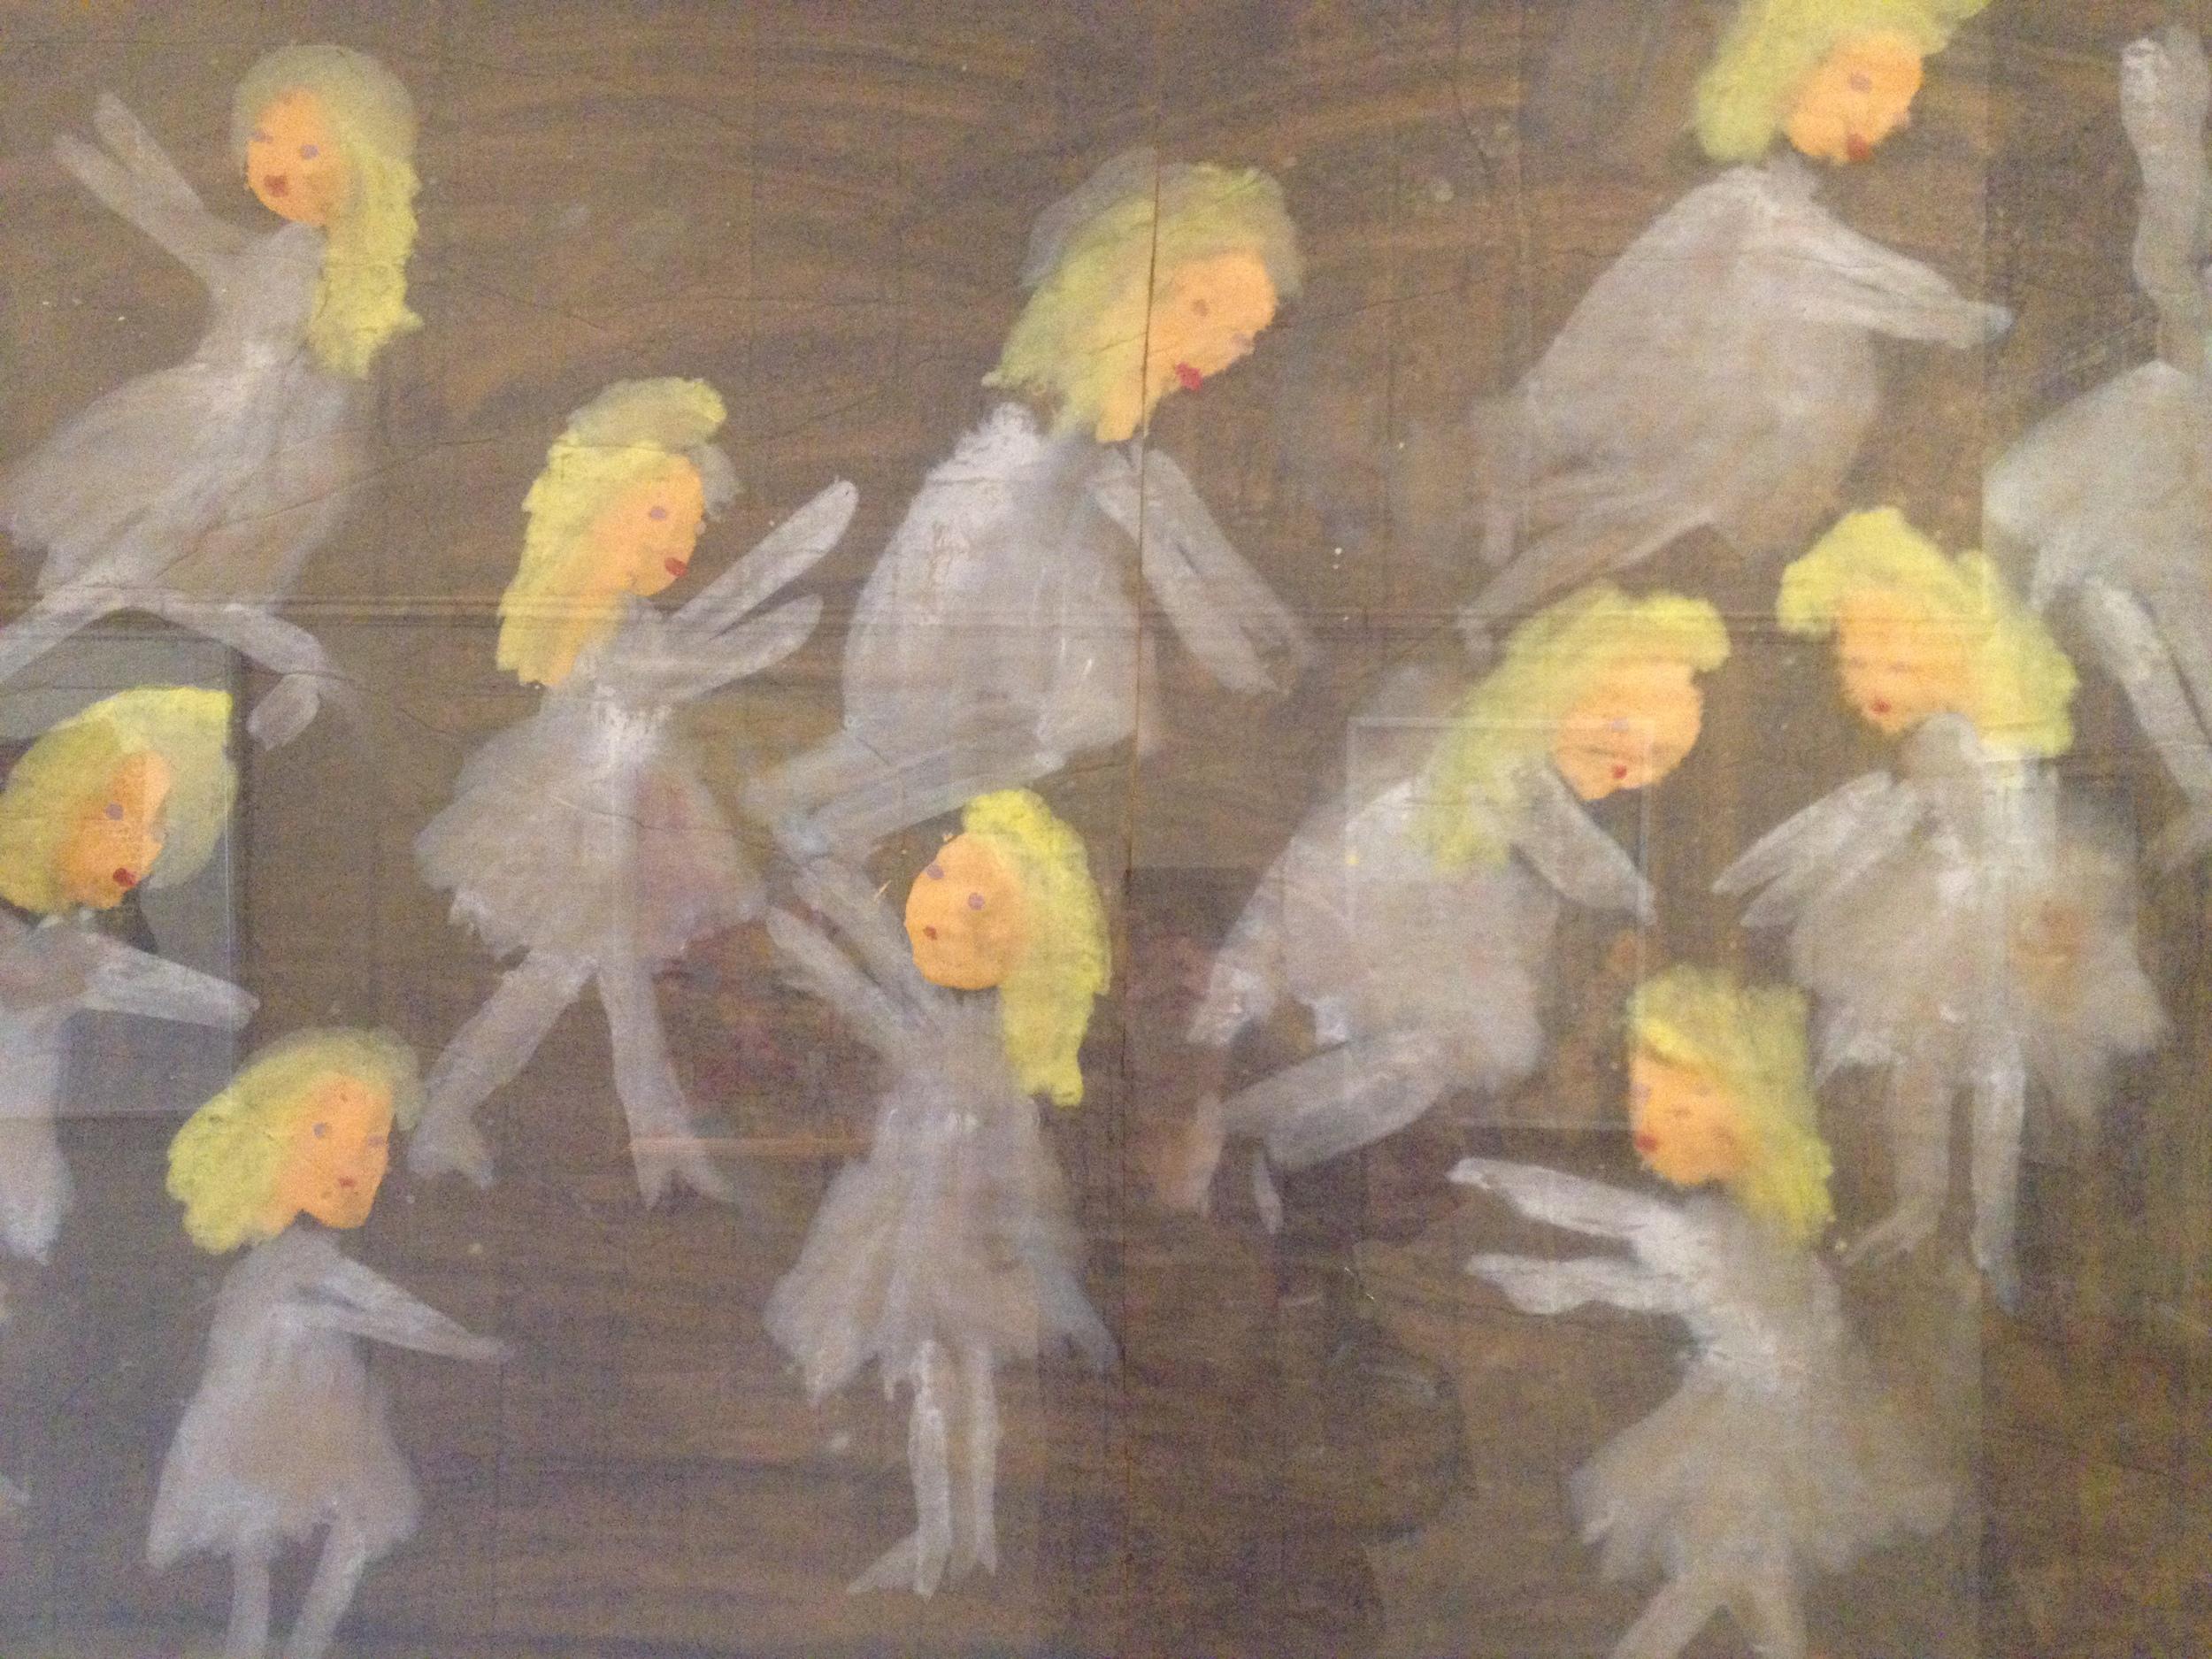 Dancing girls, I think, by Jimmy Lee Sudduth.